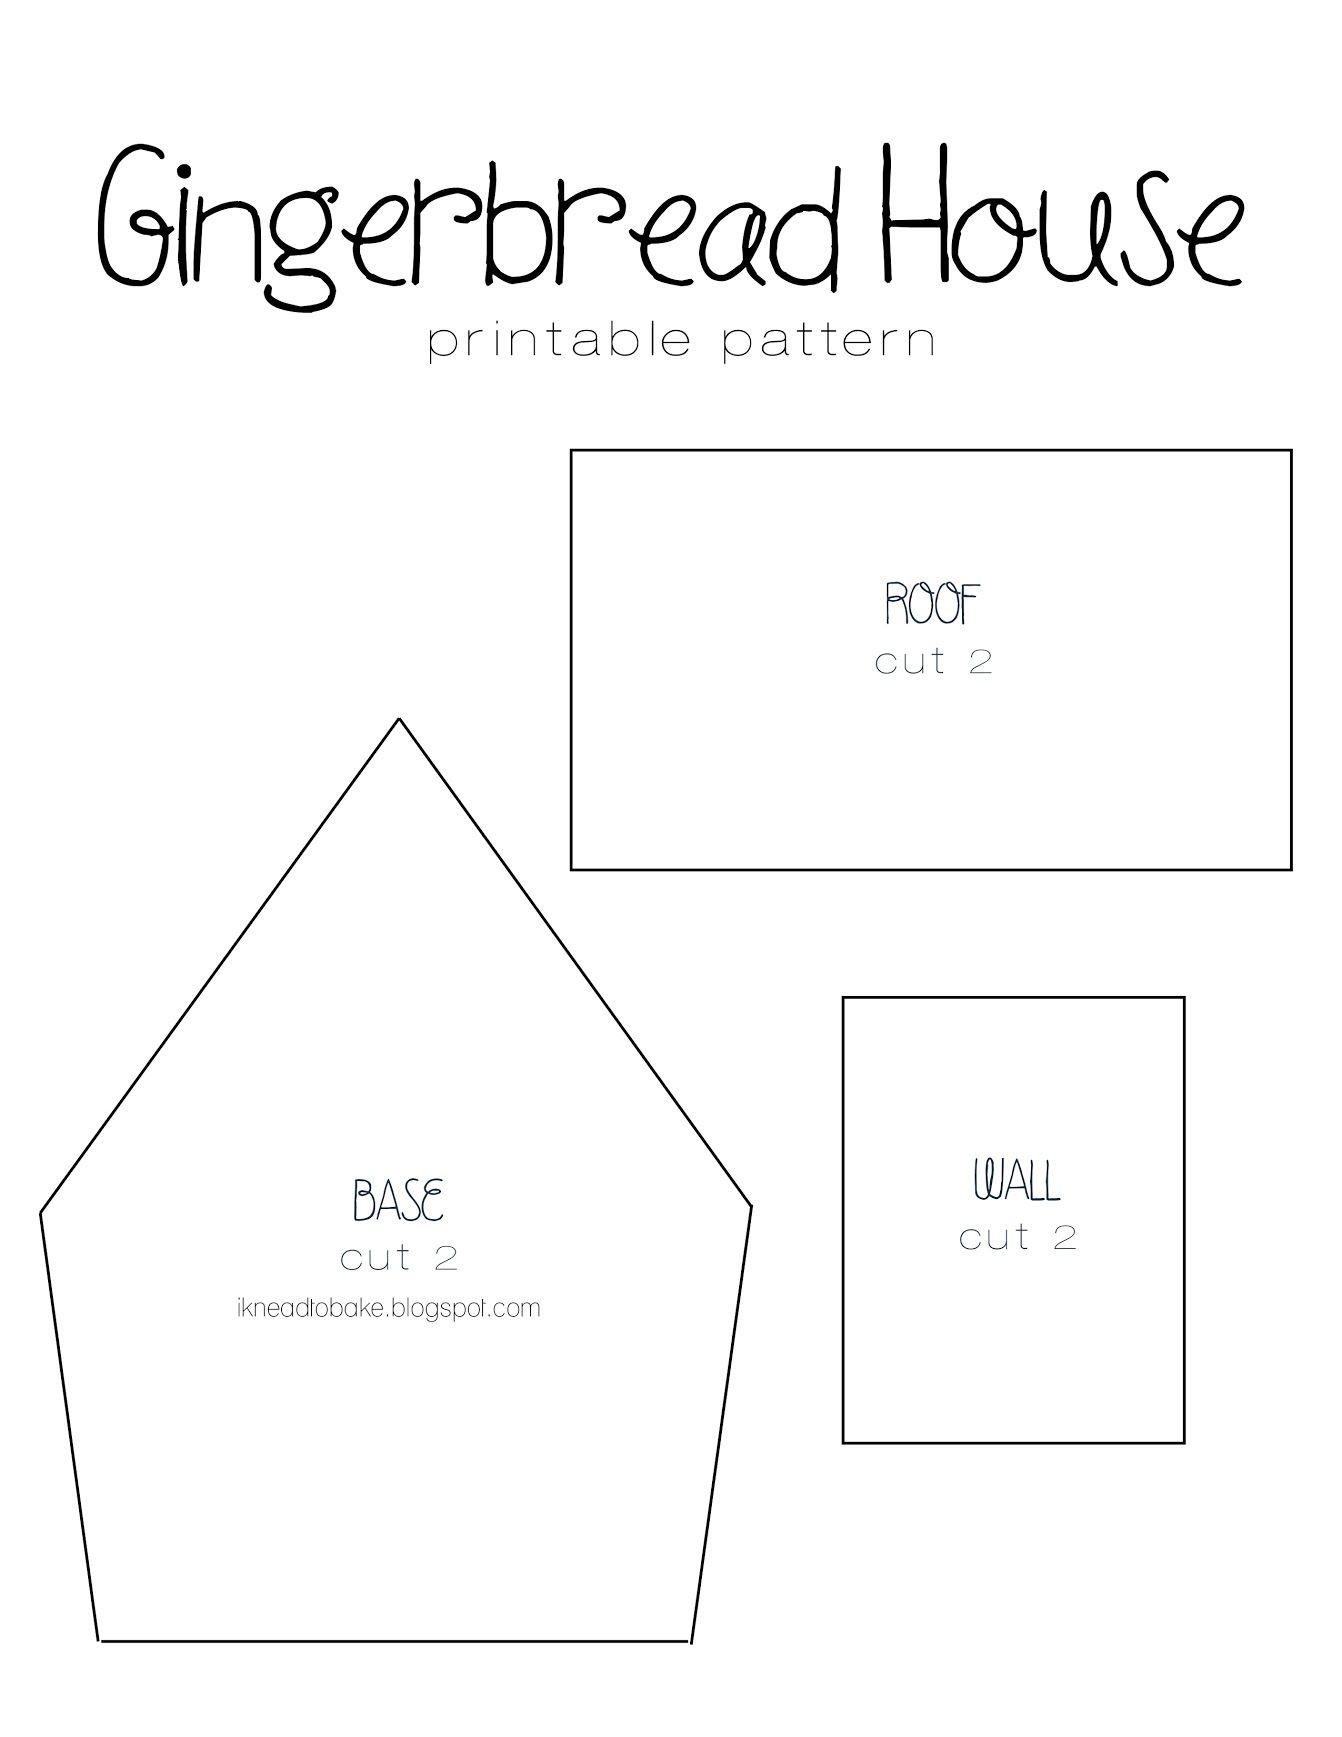 Mostrando ikneadtobake_gingerbread template.jpg   Ginger Bread house ...